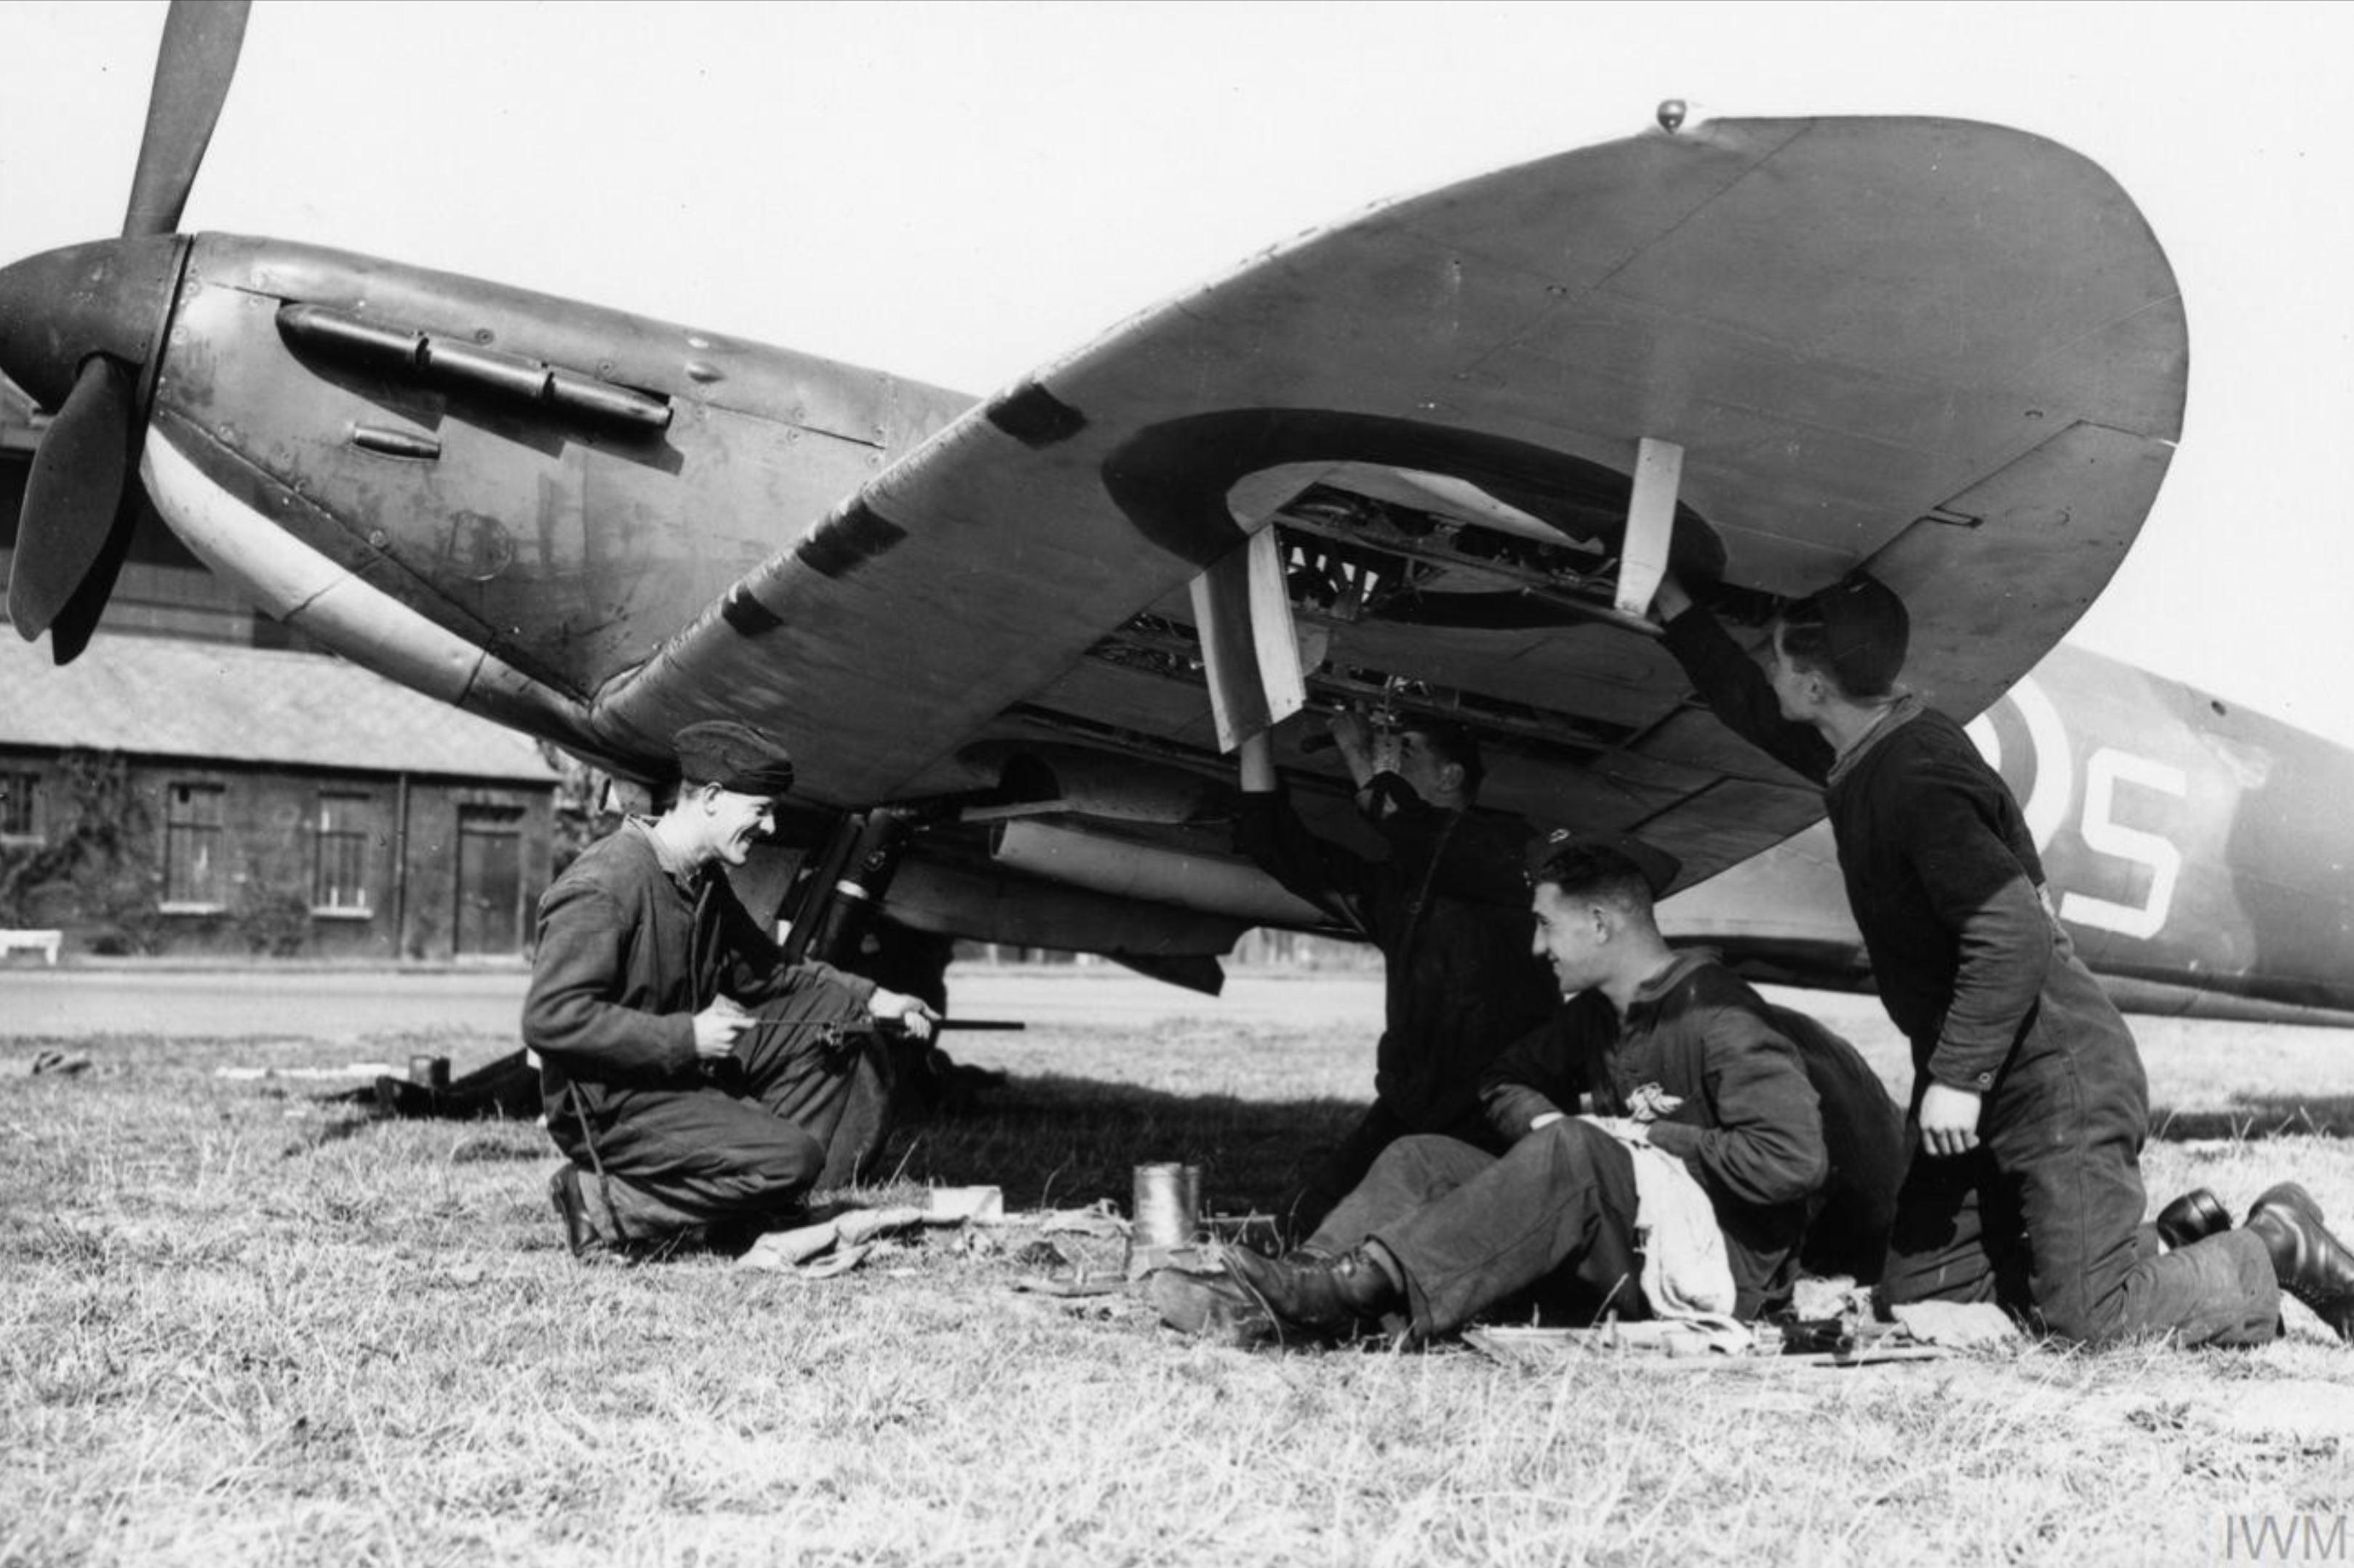 Spitfire MkI being rearmed at Biggin Hill Sep 1940 IWM HU104499